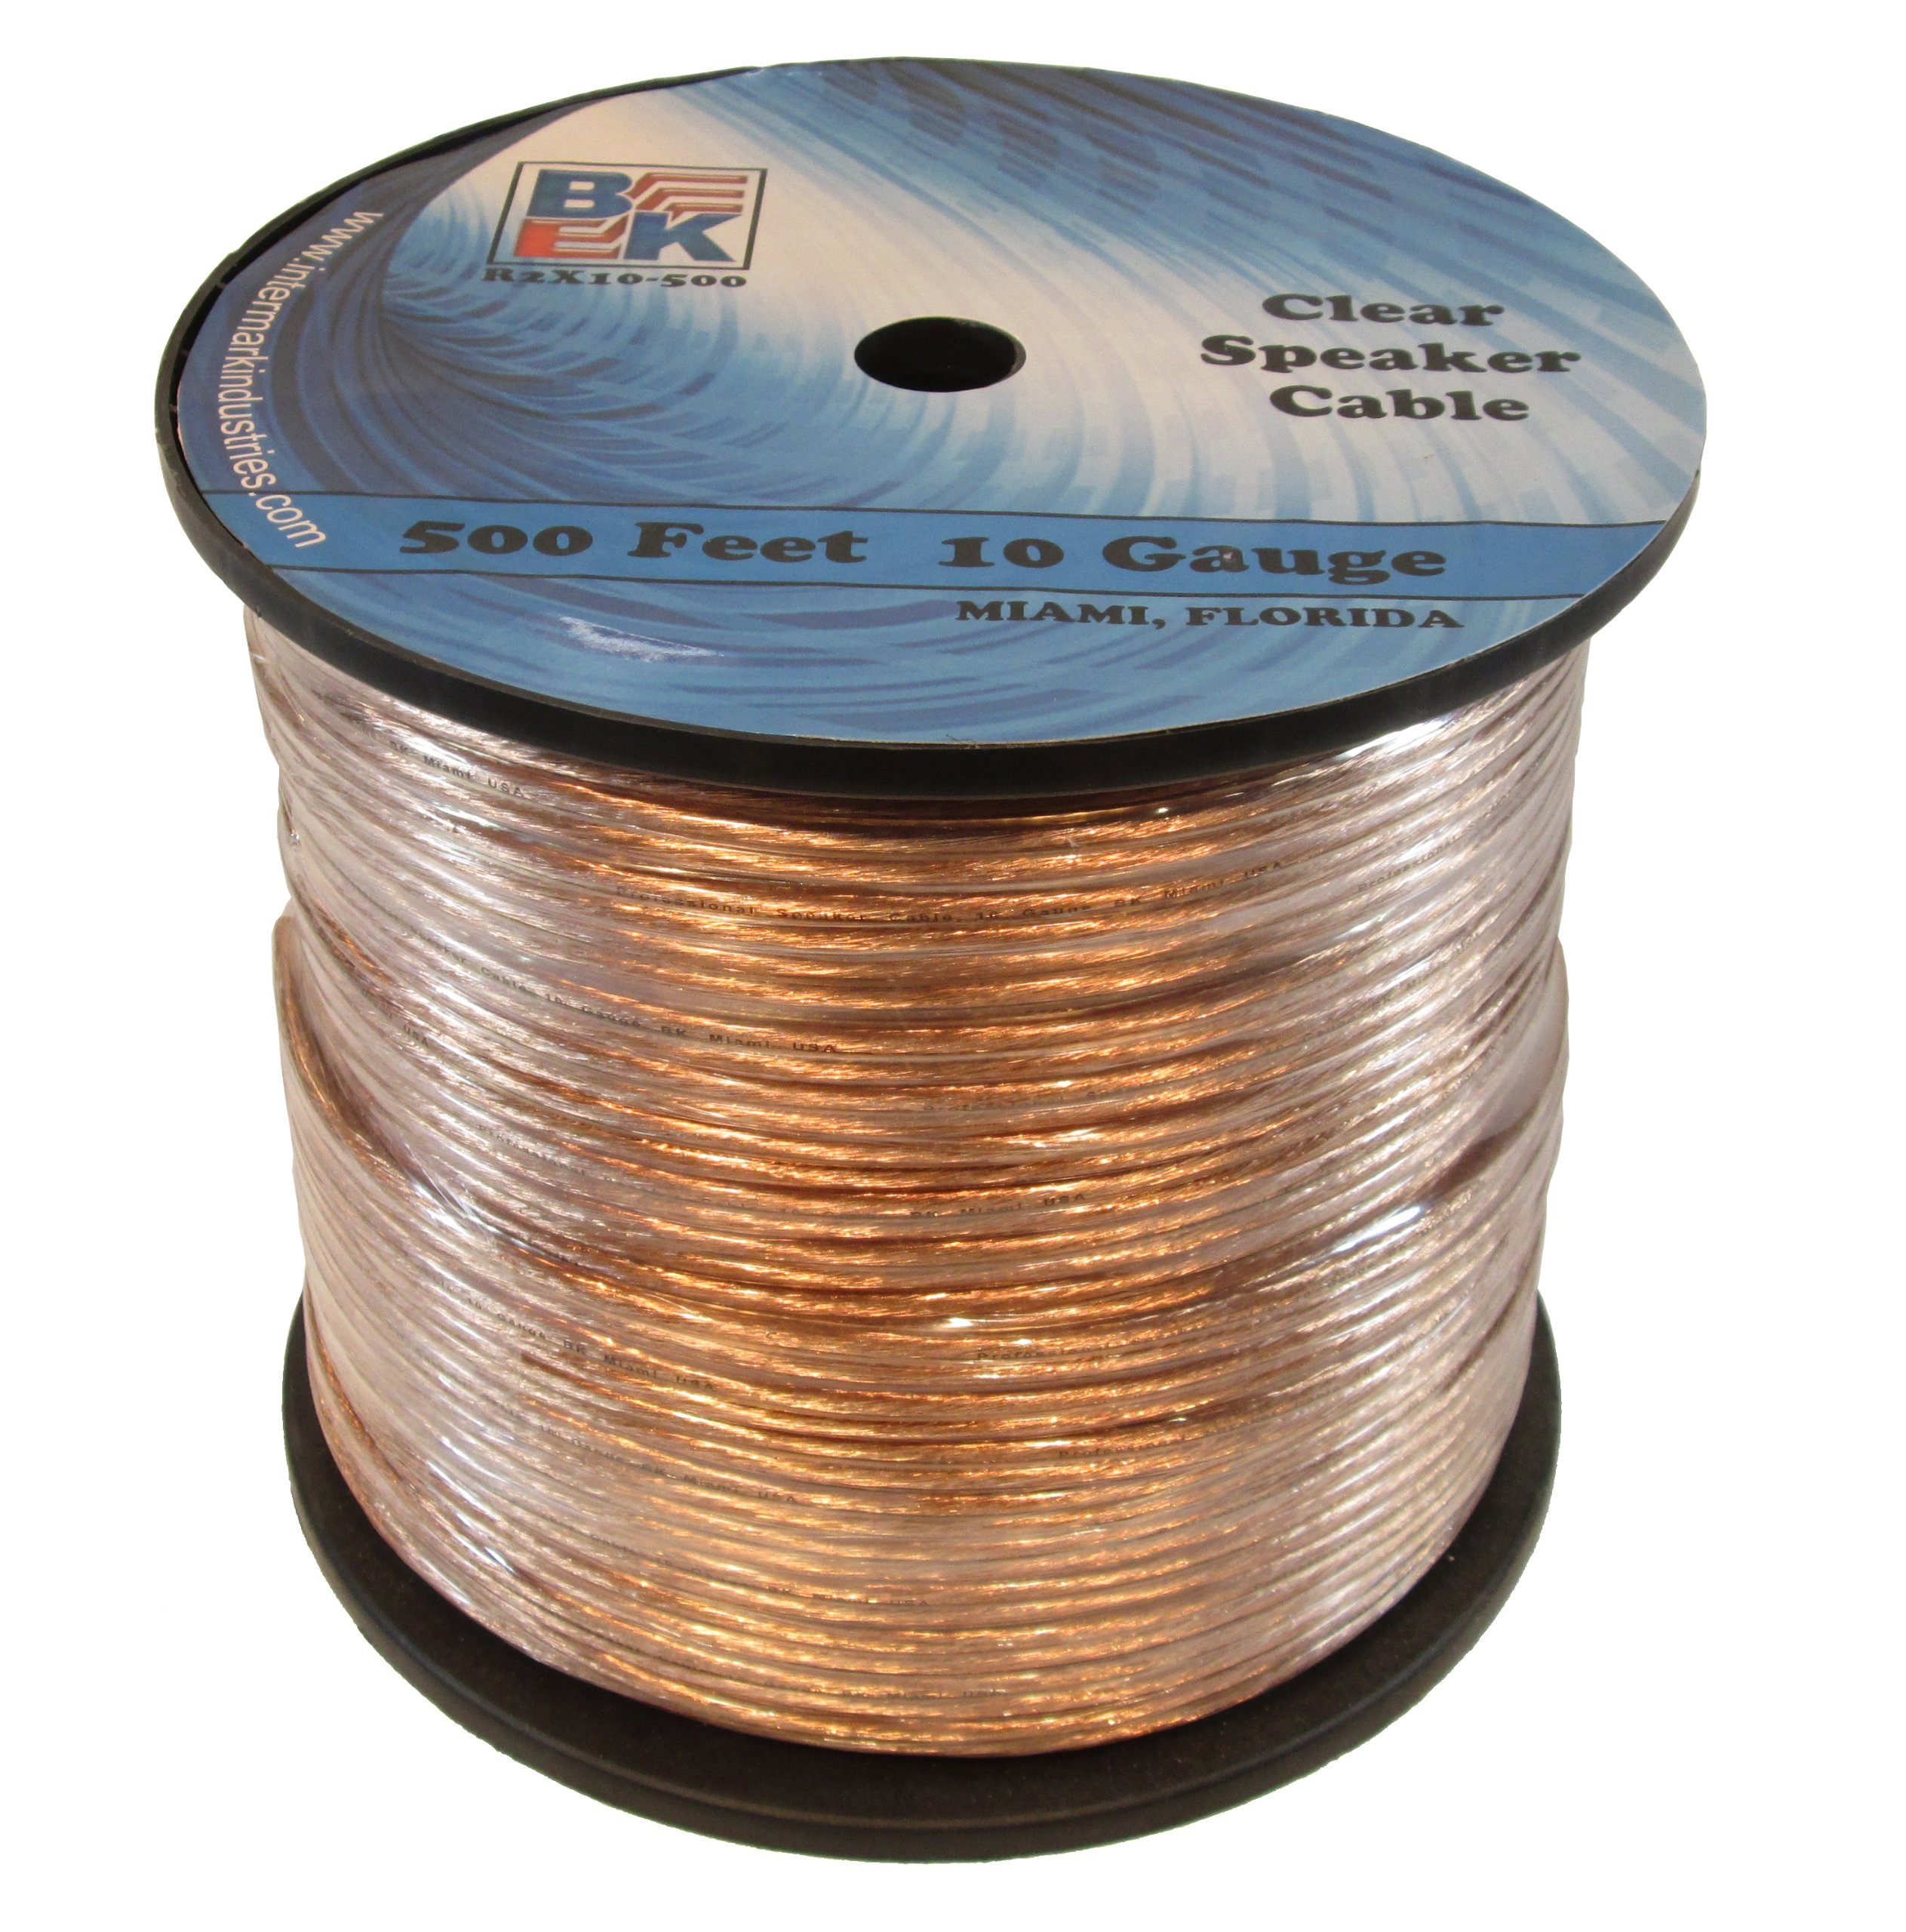 Blast King IR2X10-500 10 Gauge 500-Feet Speaker Wire